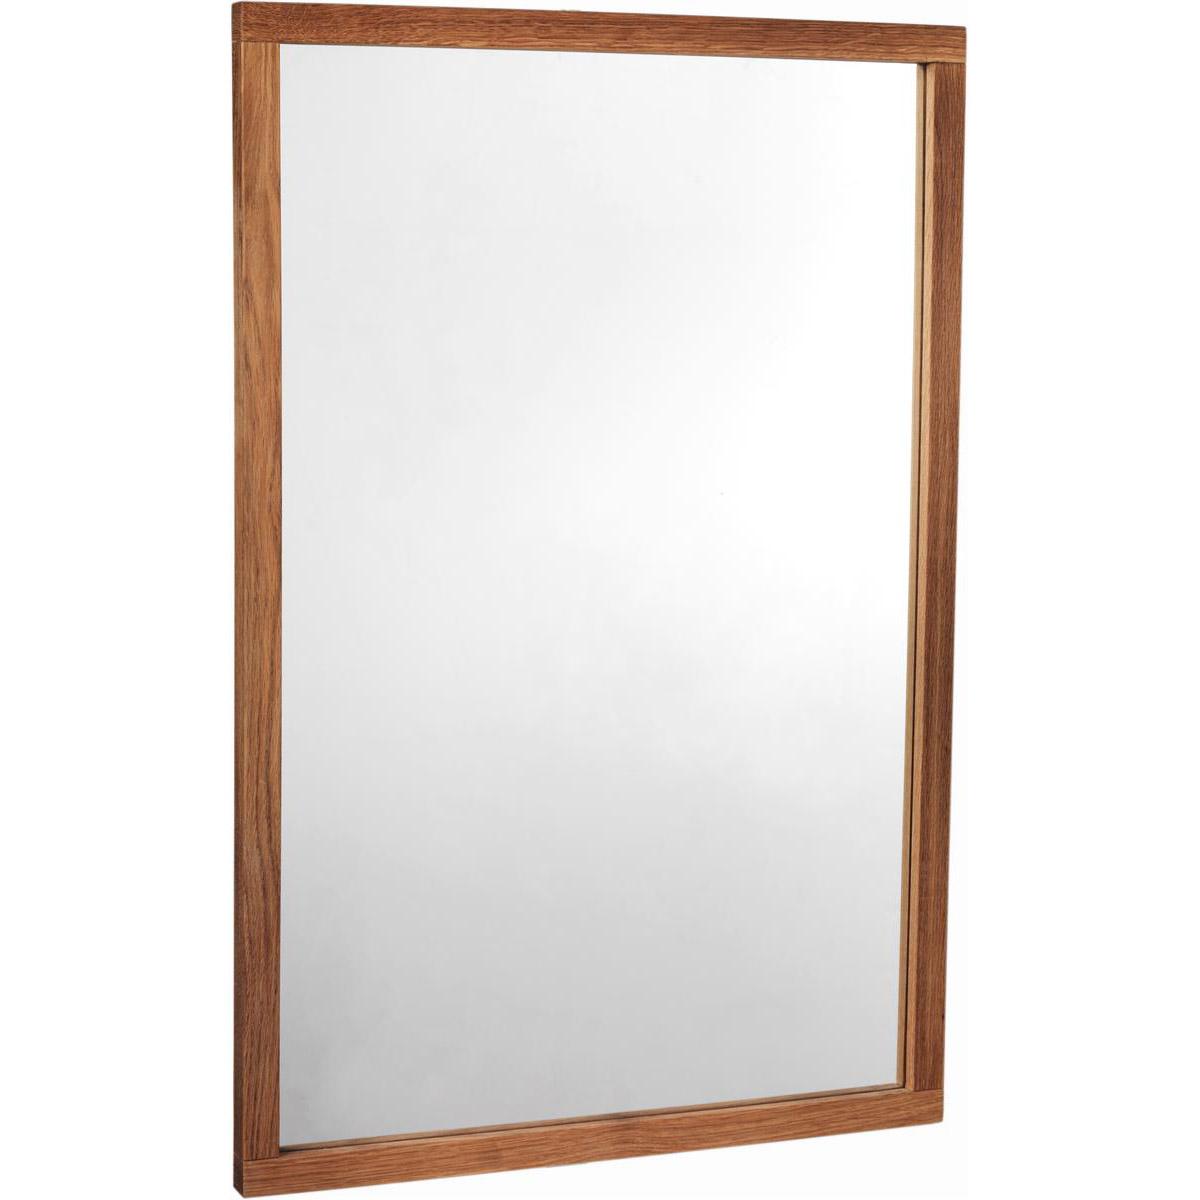 Confetti spegel 60x90 ek